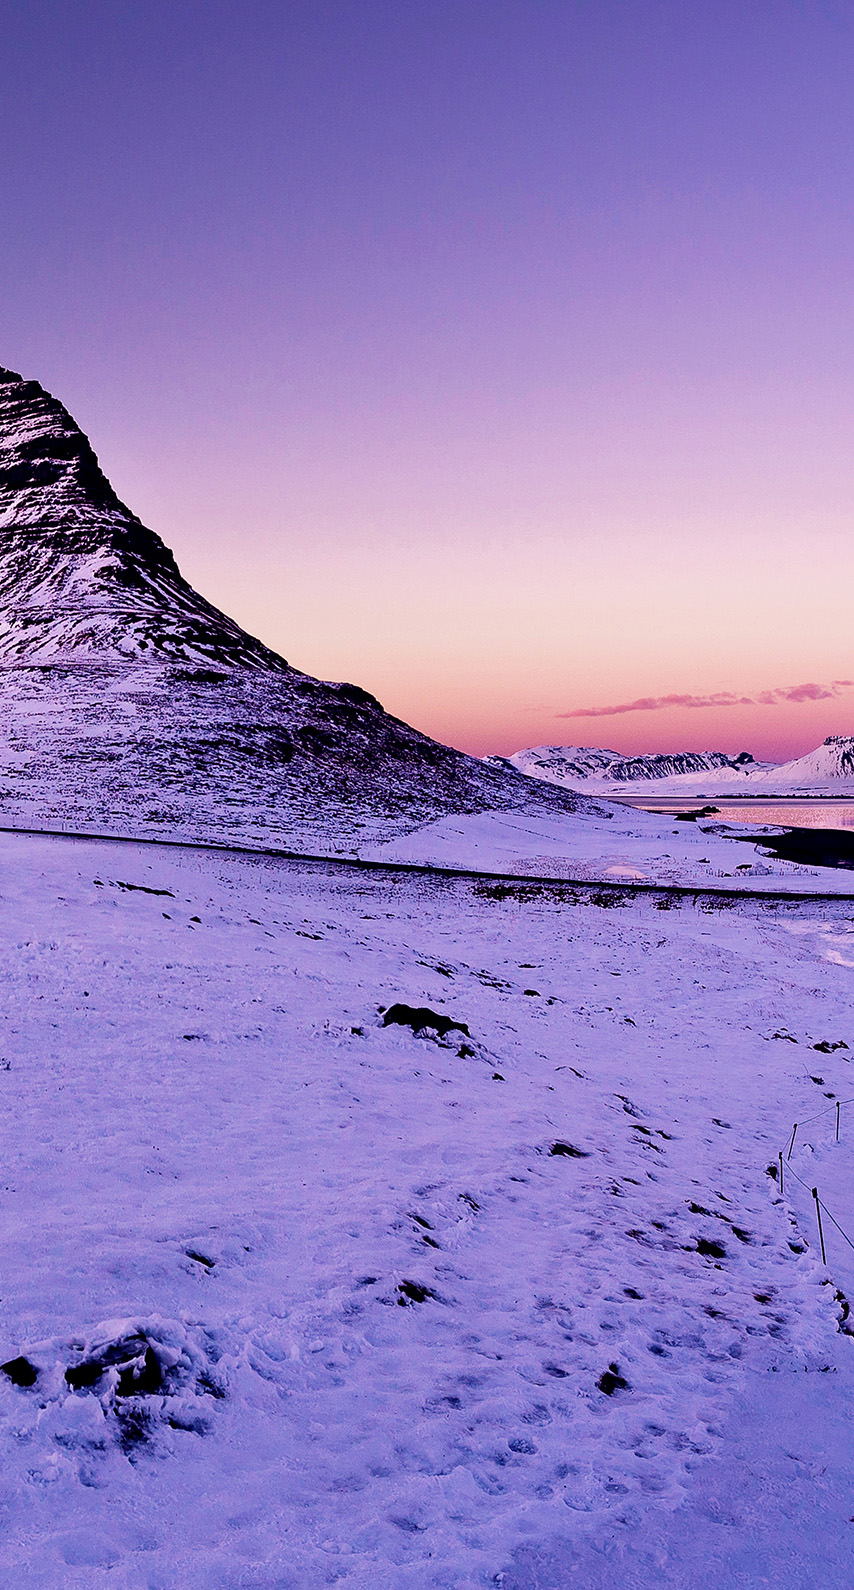 summit, mountainous landforms